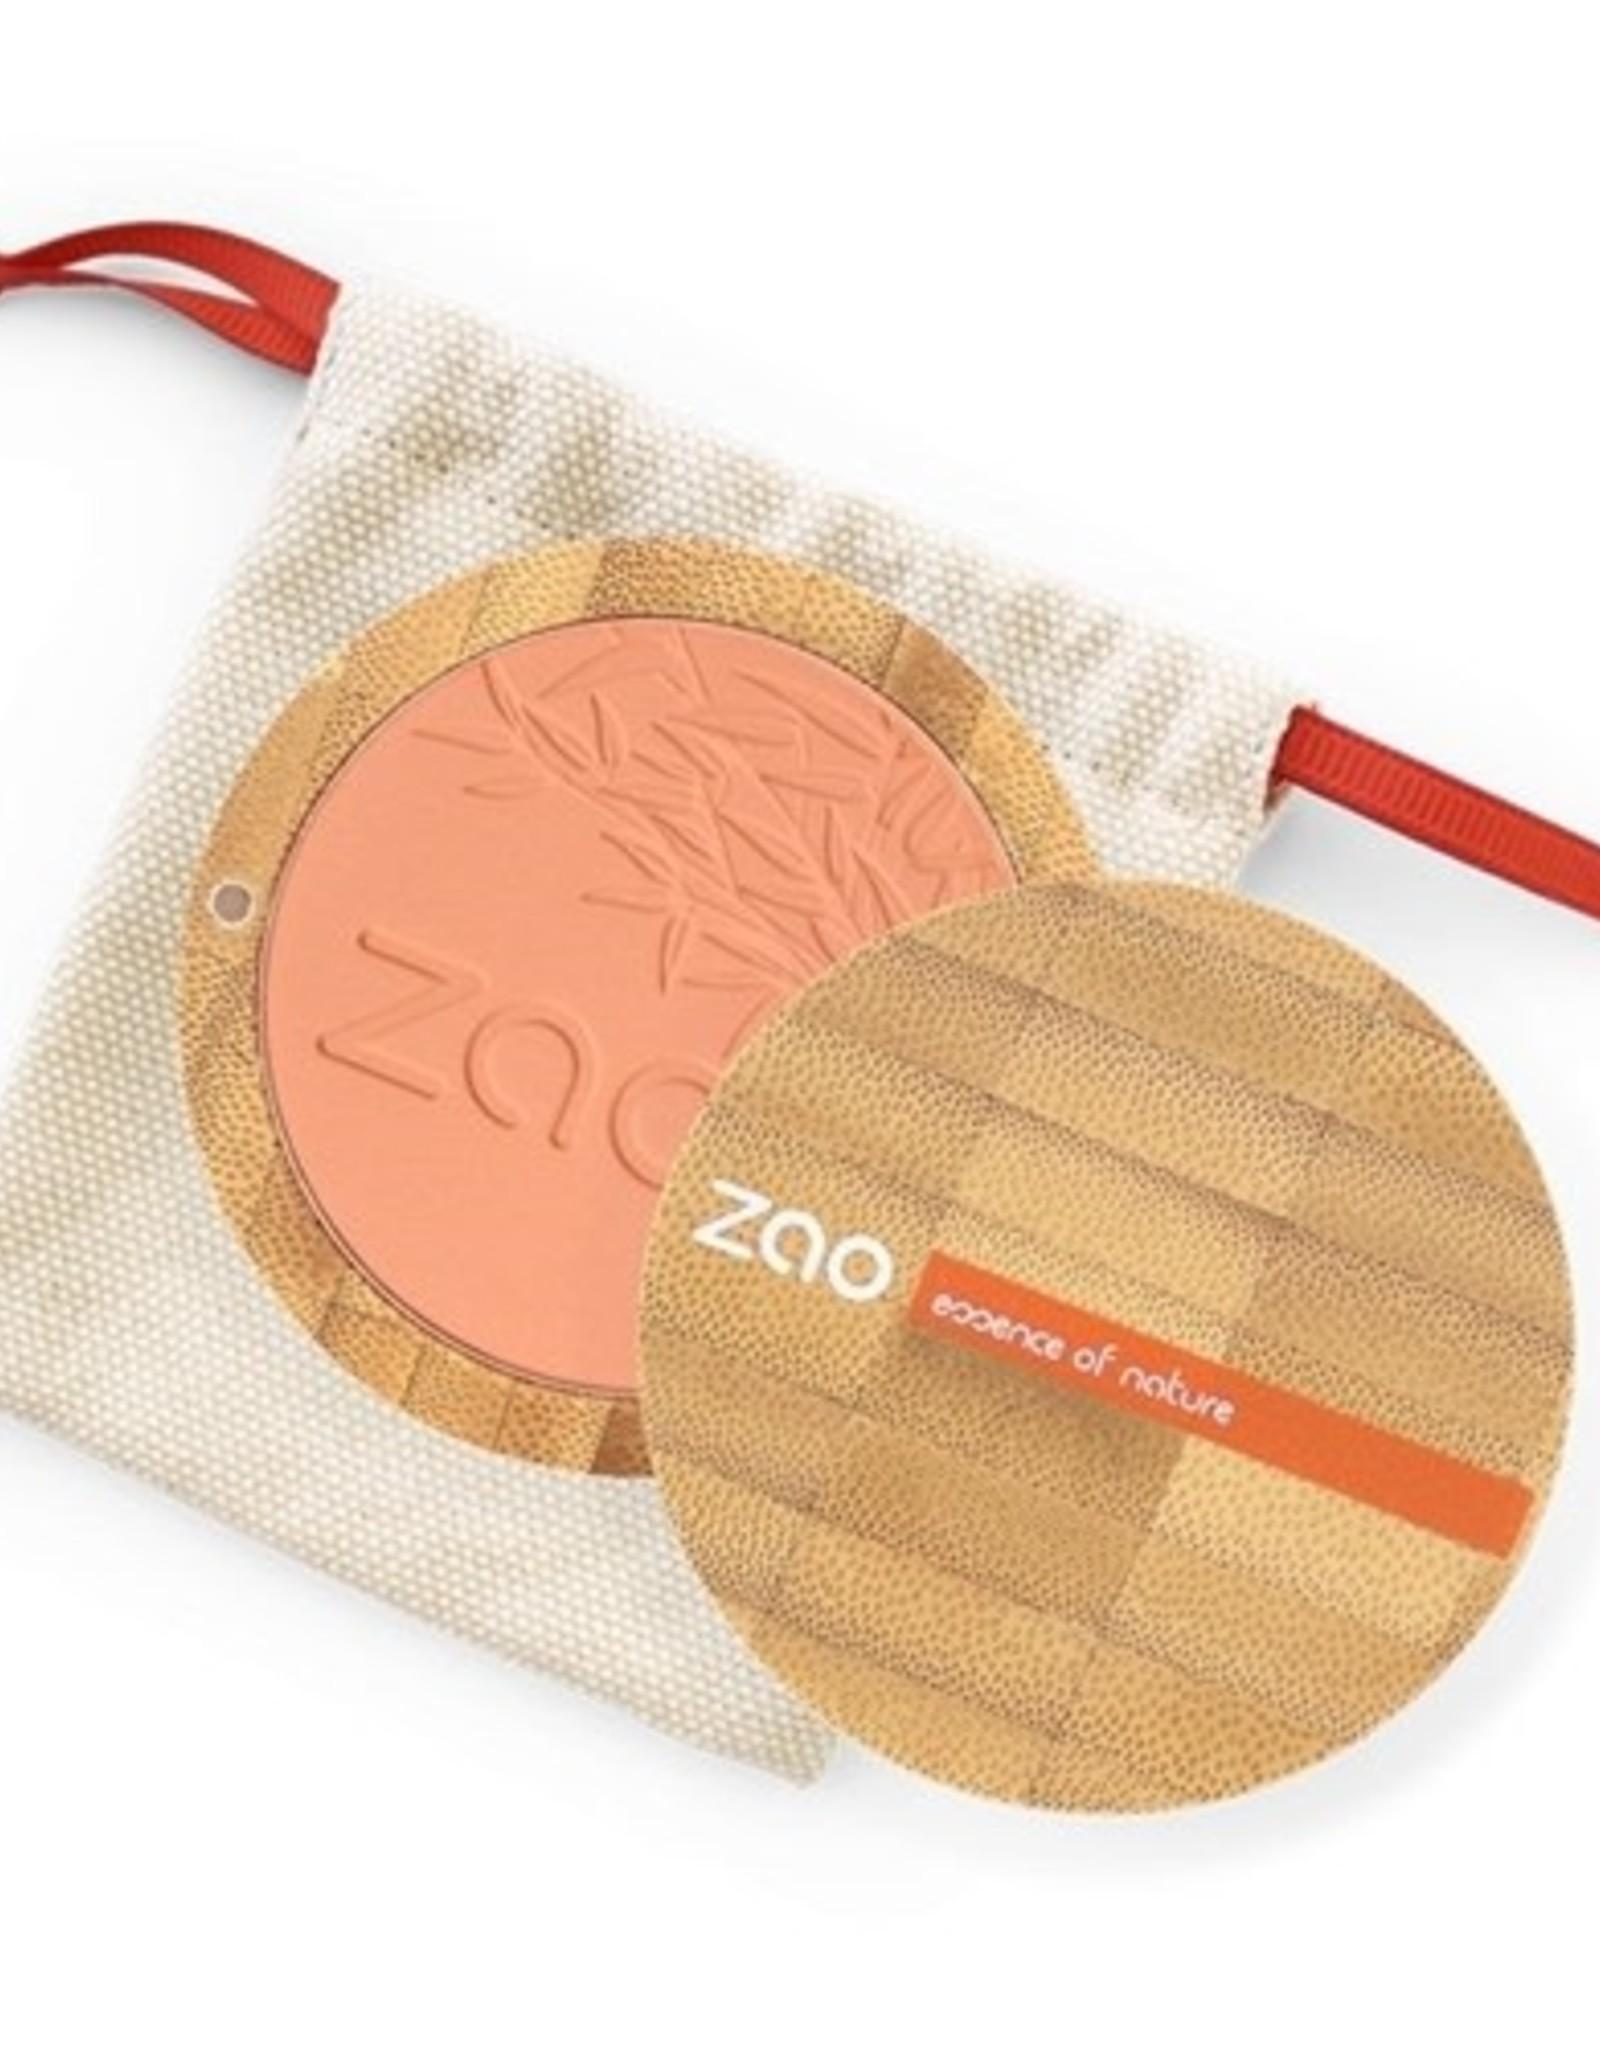 Zao ZAO Bamboe Blush 326 (Natural Radiance)